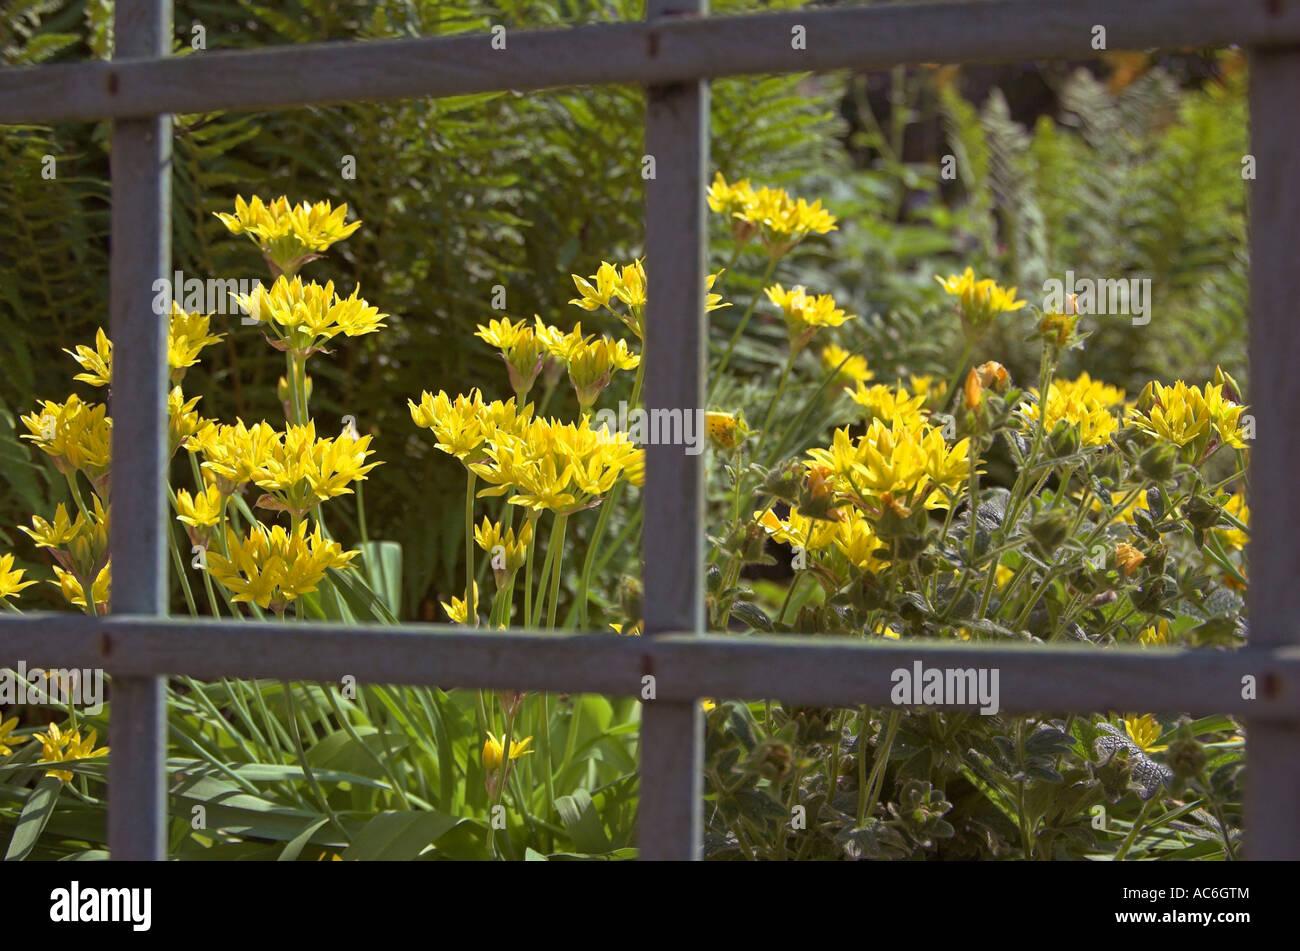 Garden Variety Ramsons Allium Spp Through Garden Trestle   Stock Image